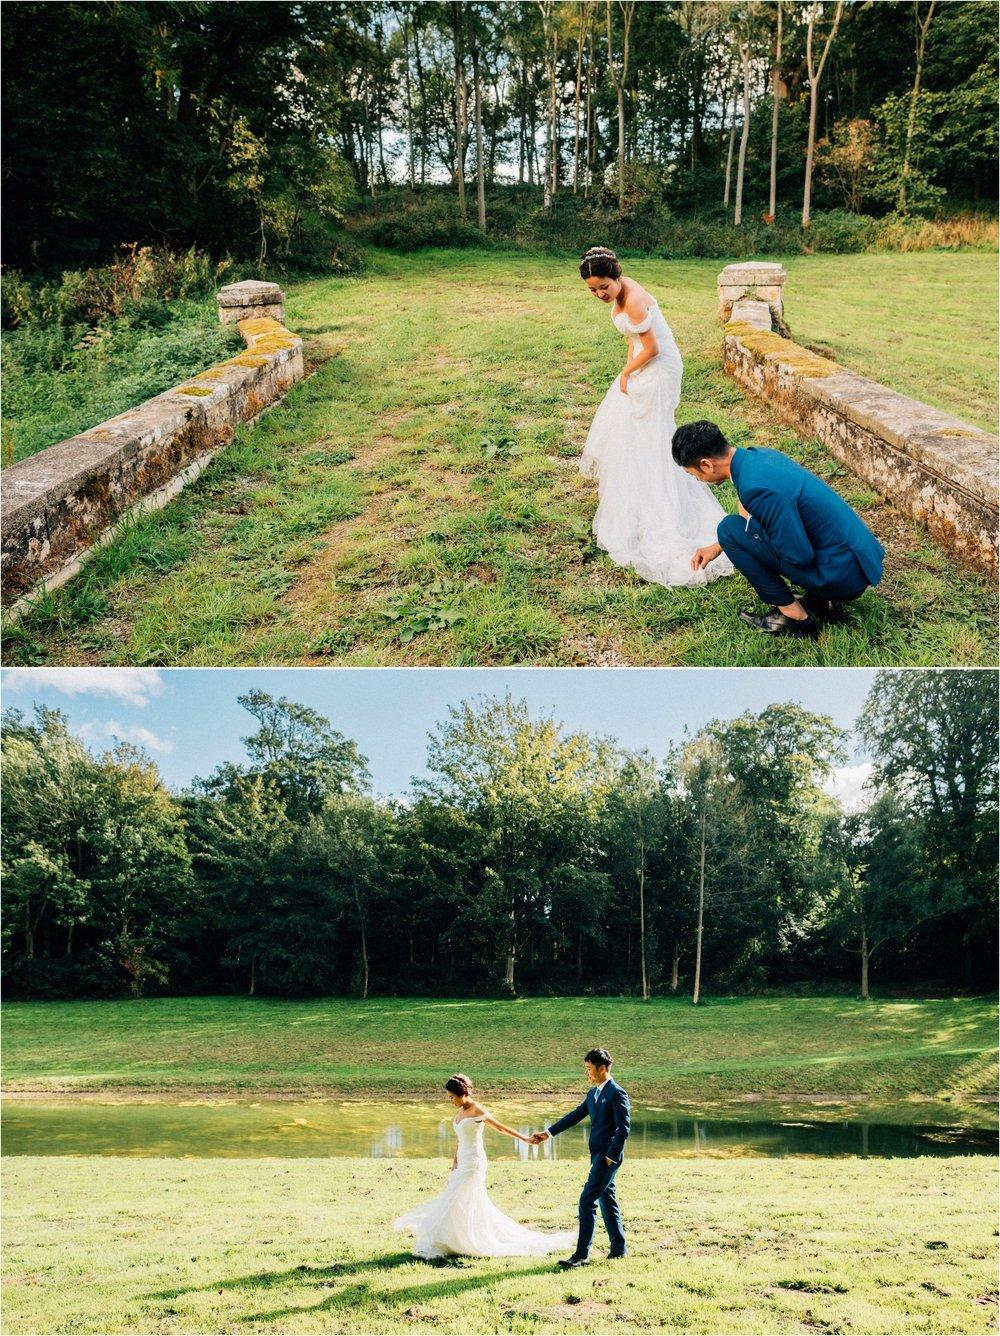 York city elopement wedding photographer_0196.jpg